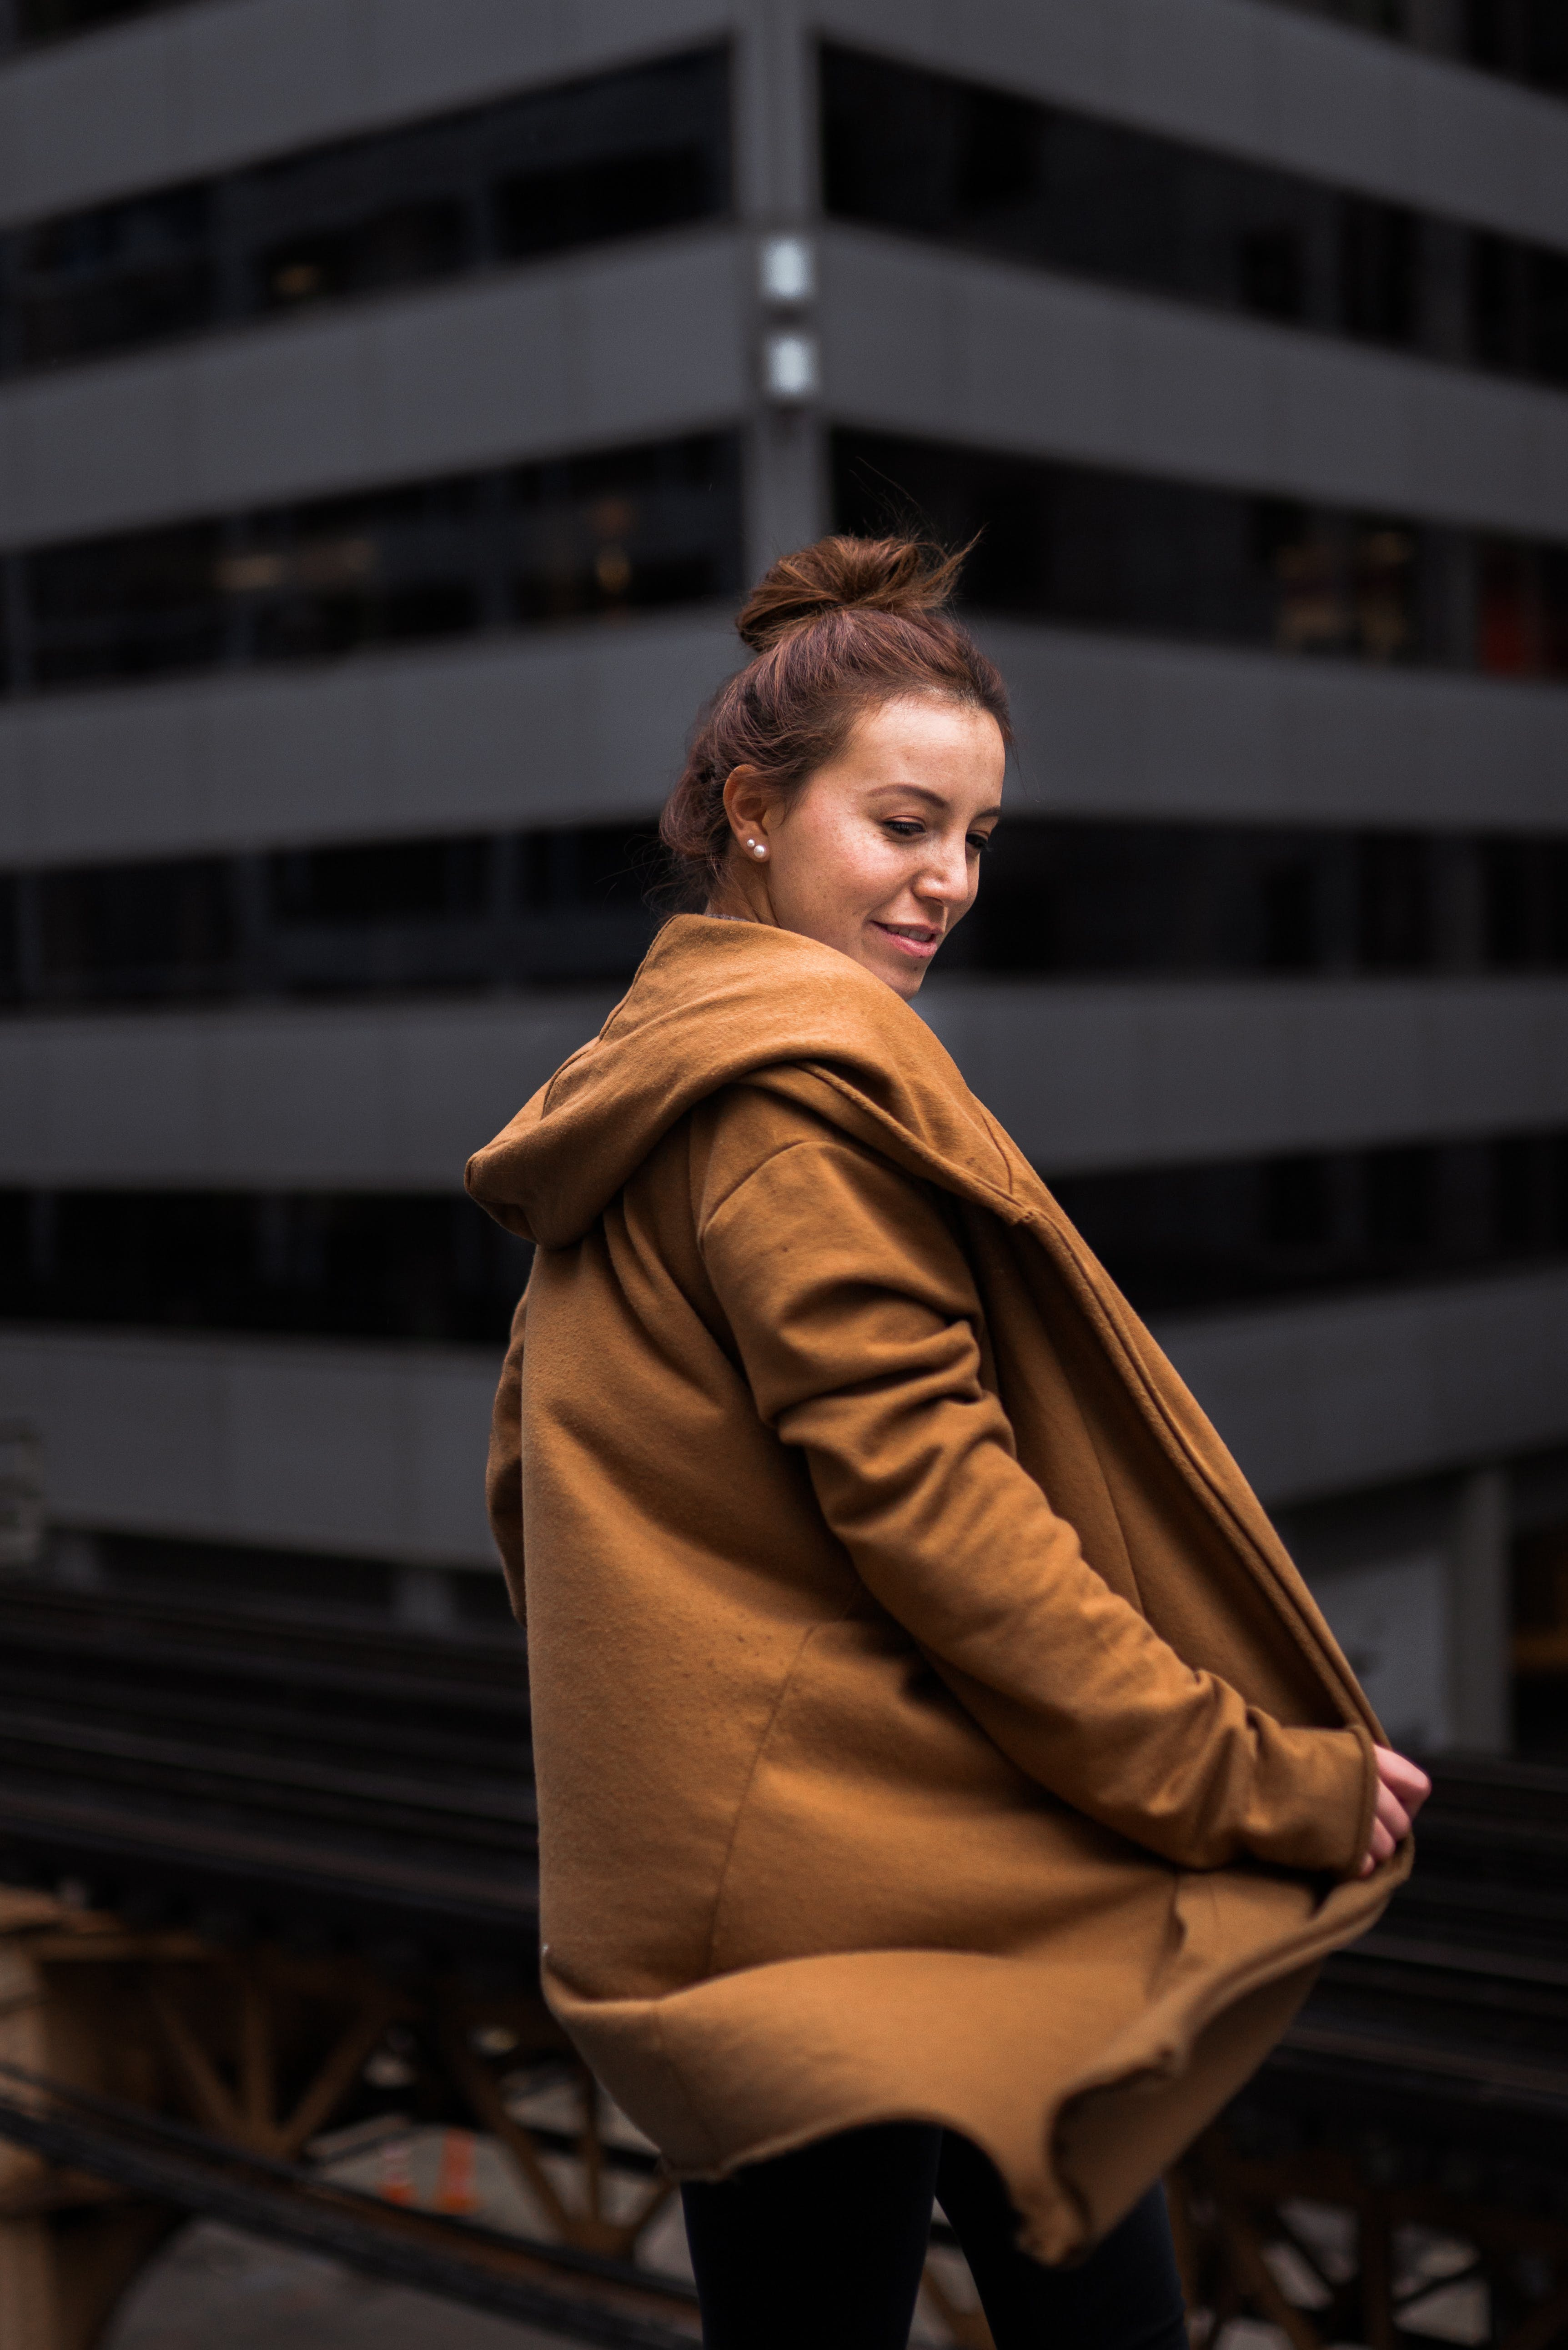 Kostenloses Stock Foto zu elegant, fashion, frau, gesichtsausdruck